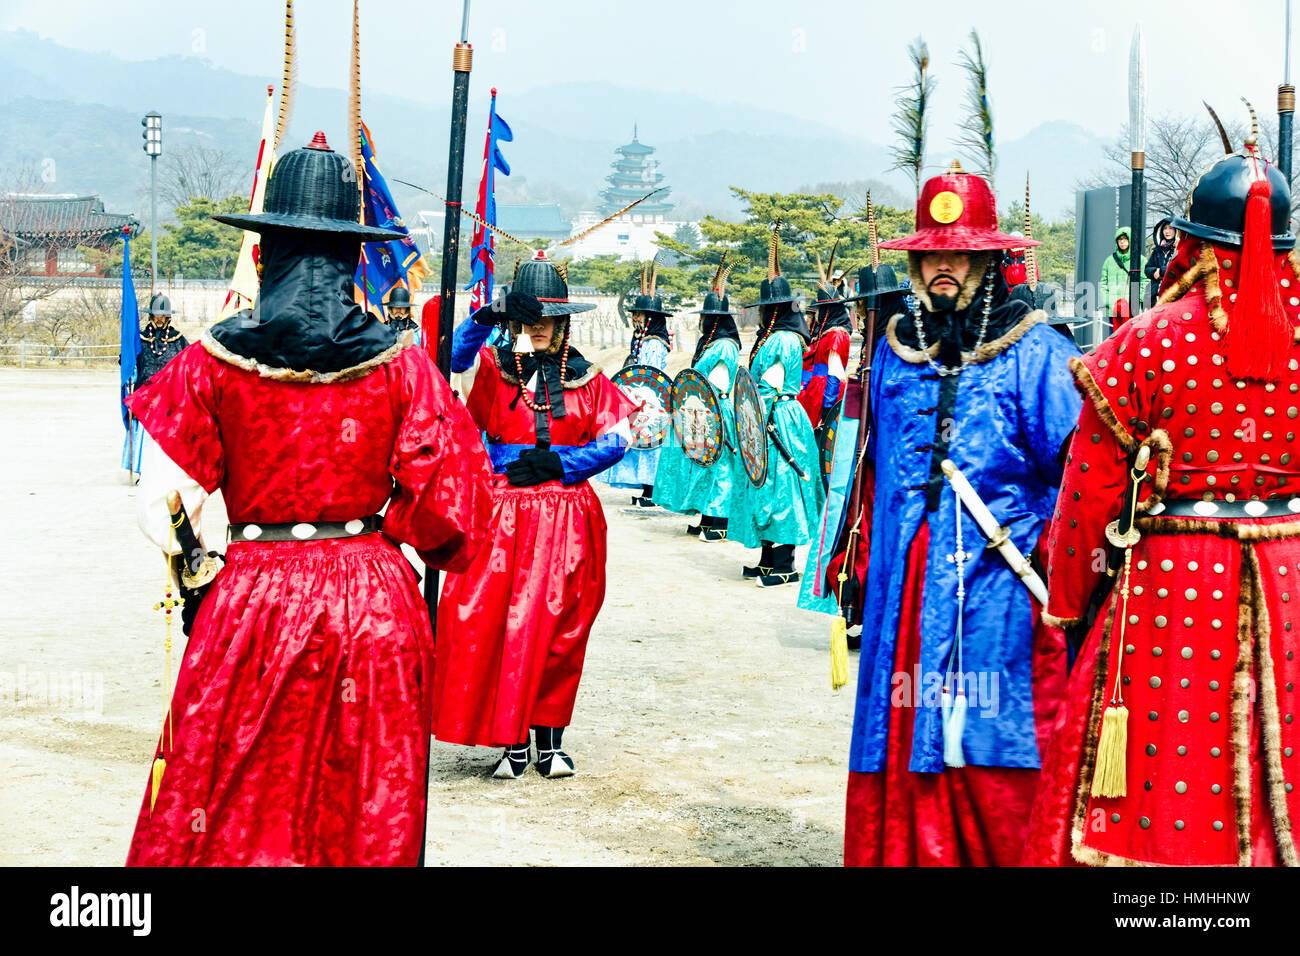 Royal Guard Inspection Ceremony, Gyeongbokgung Palace, Seoul, South Korea - Stock Image